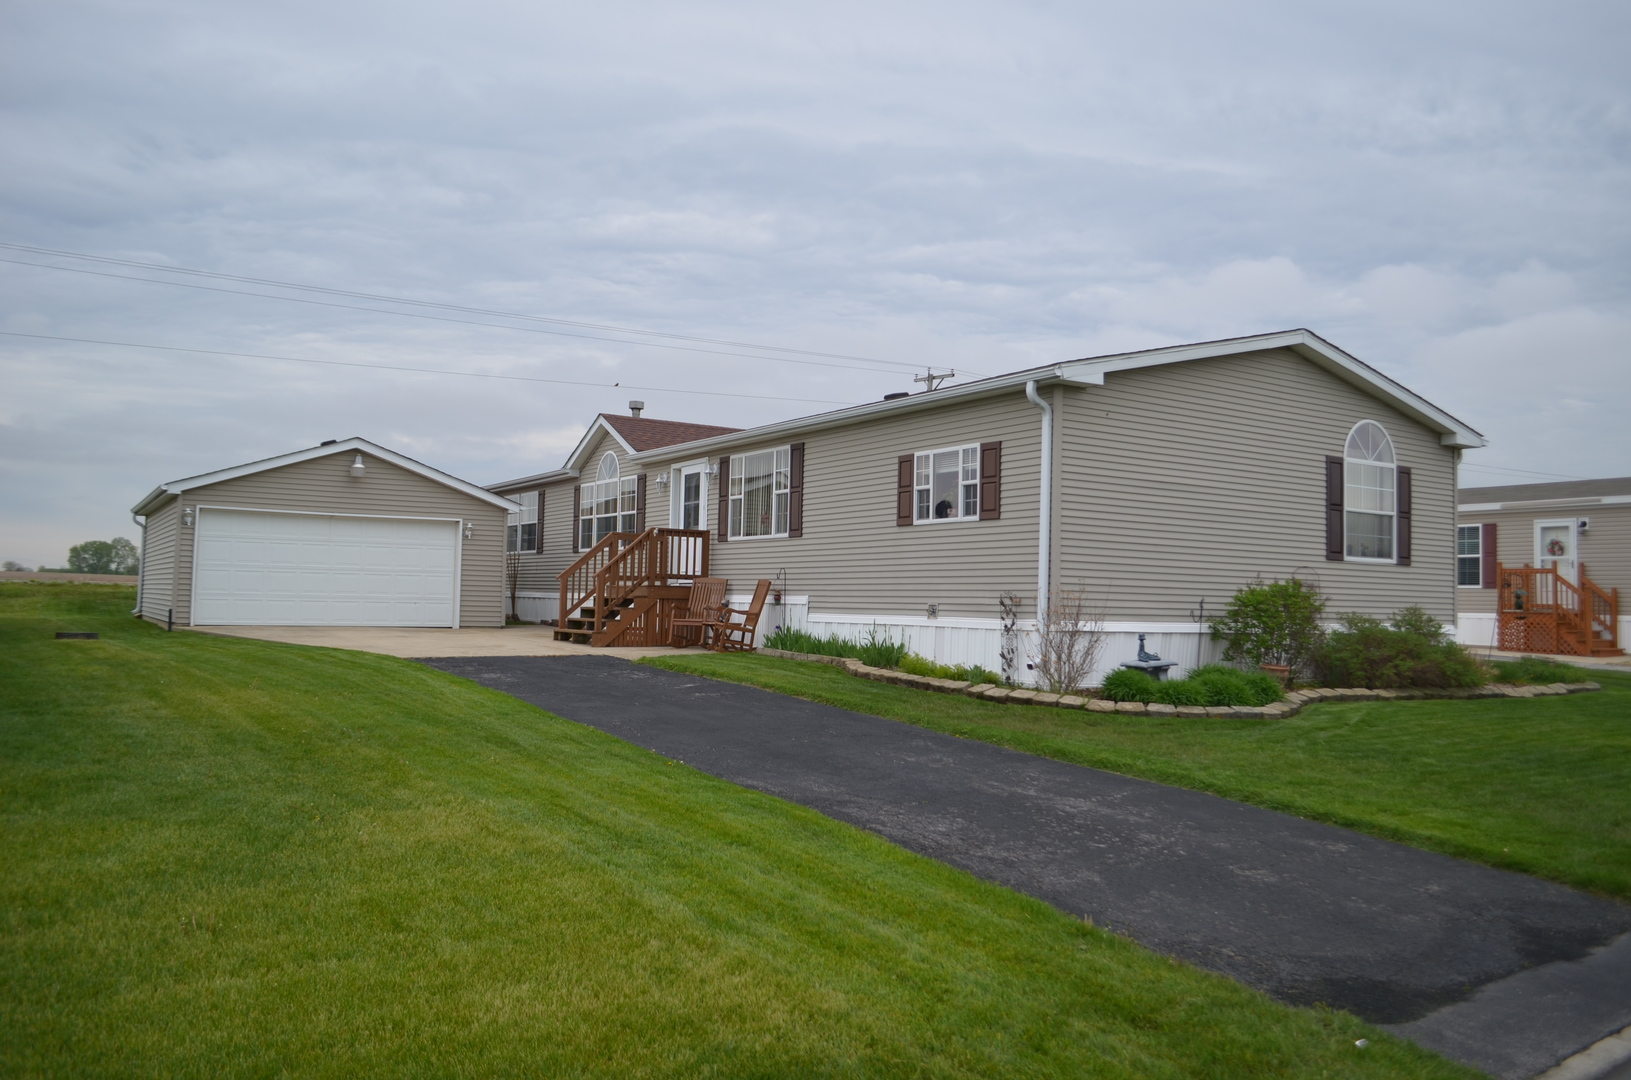 Mobile Homes for sale in BEECHER, Illinois   BEECHER MLS   BEECHER